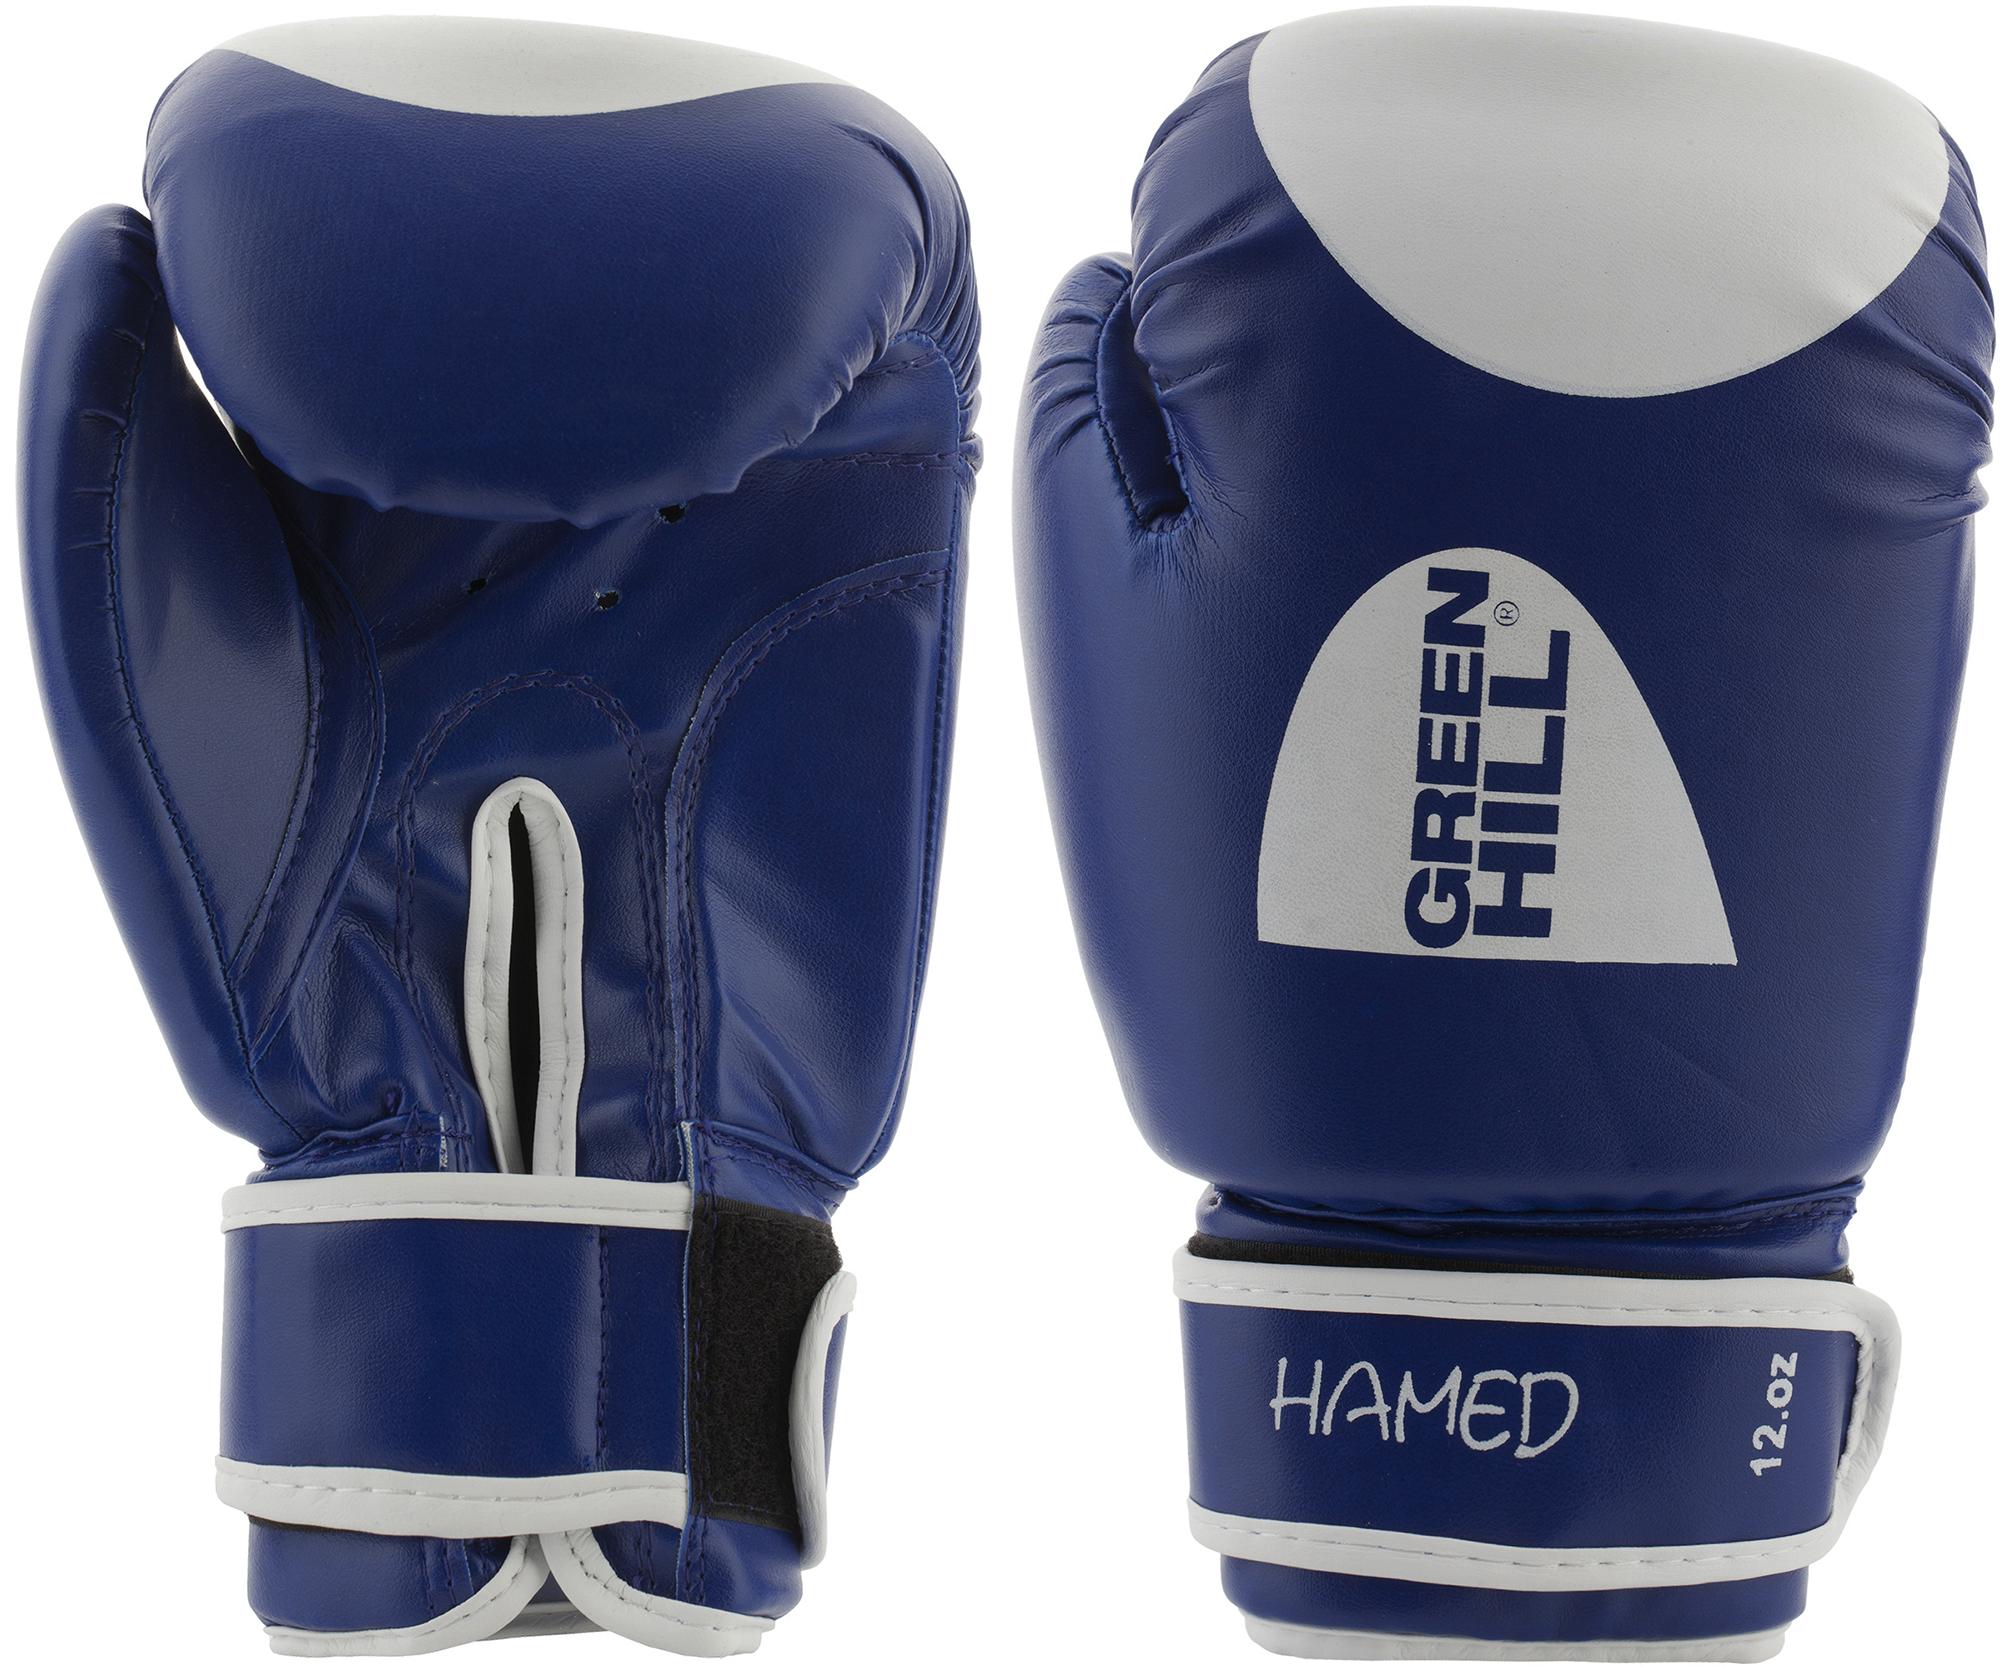 цена на Green Hill Перчатки боксерские Green Hill Hamed, размер 14 oz